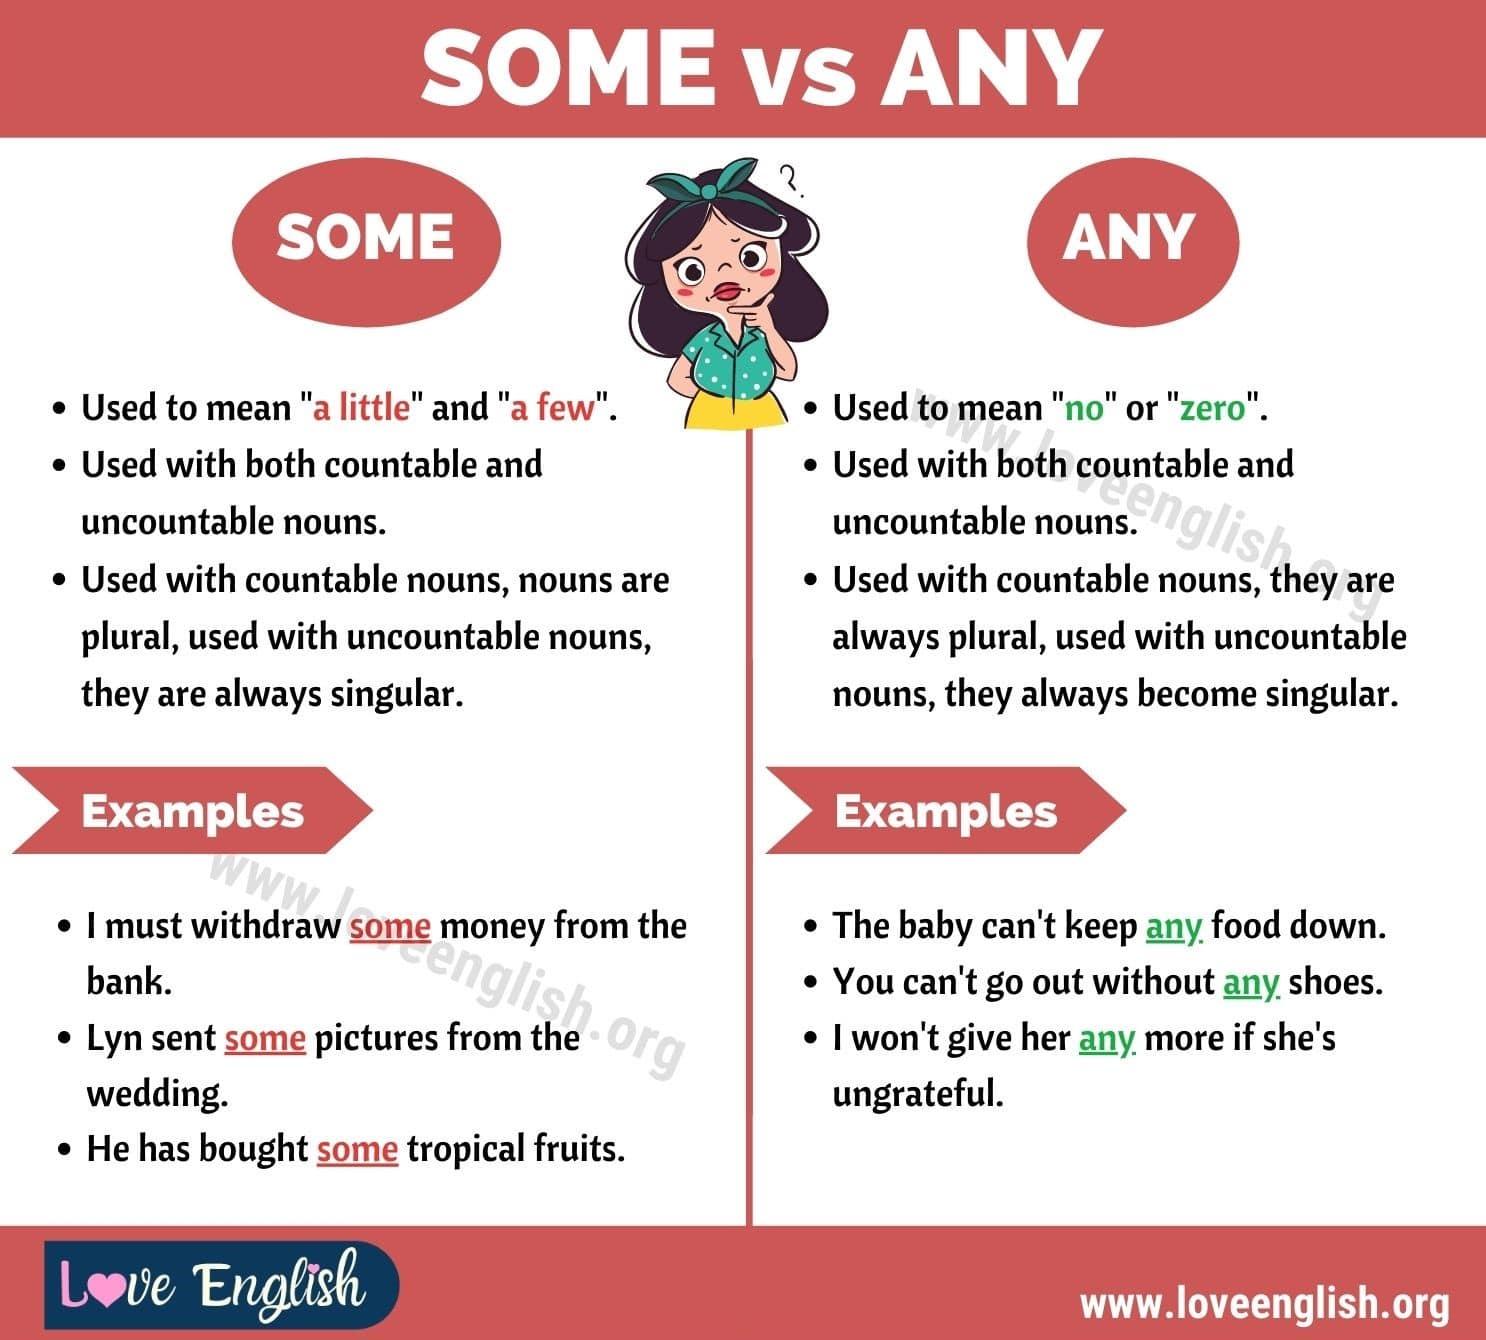 SOME vs ANY